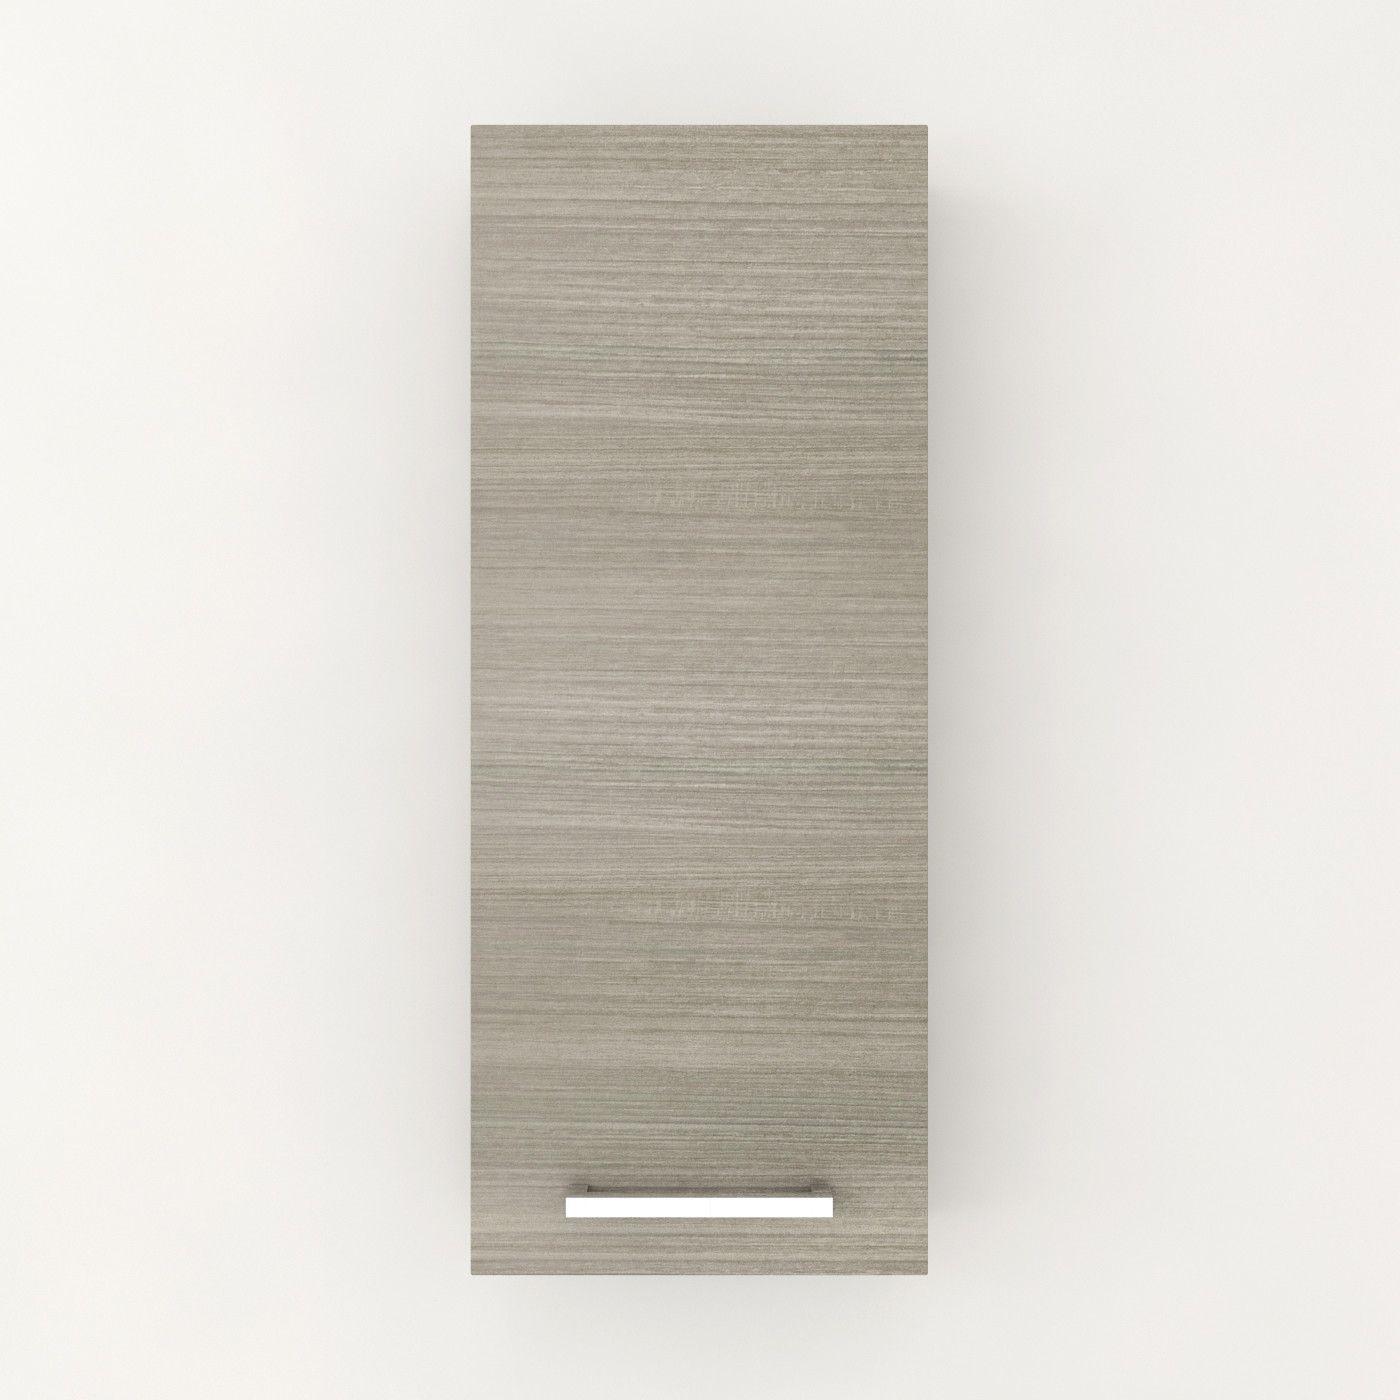 cutler kitchen bath silhouette 11 5 x 30 75 wall mounted